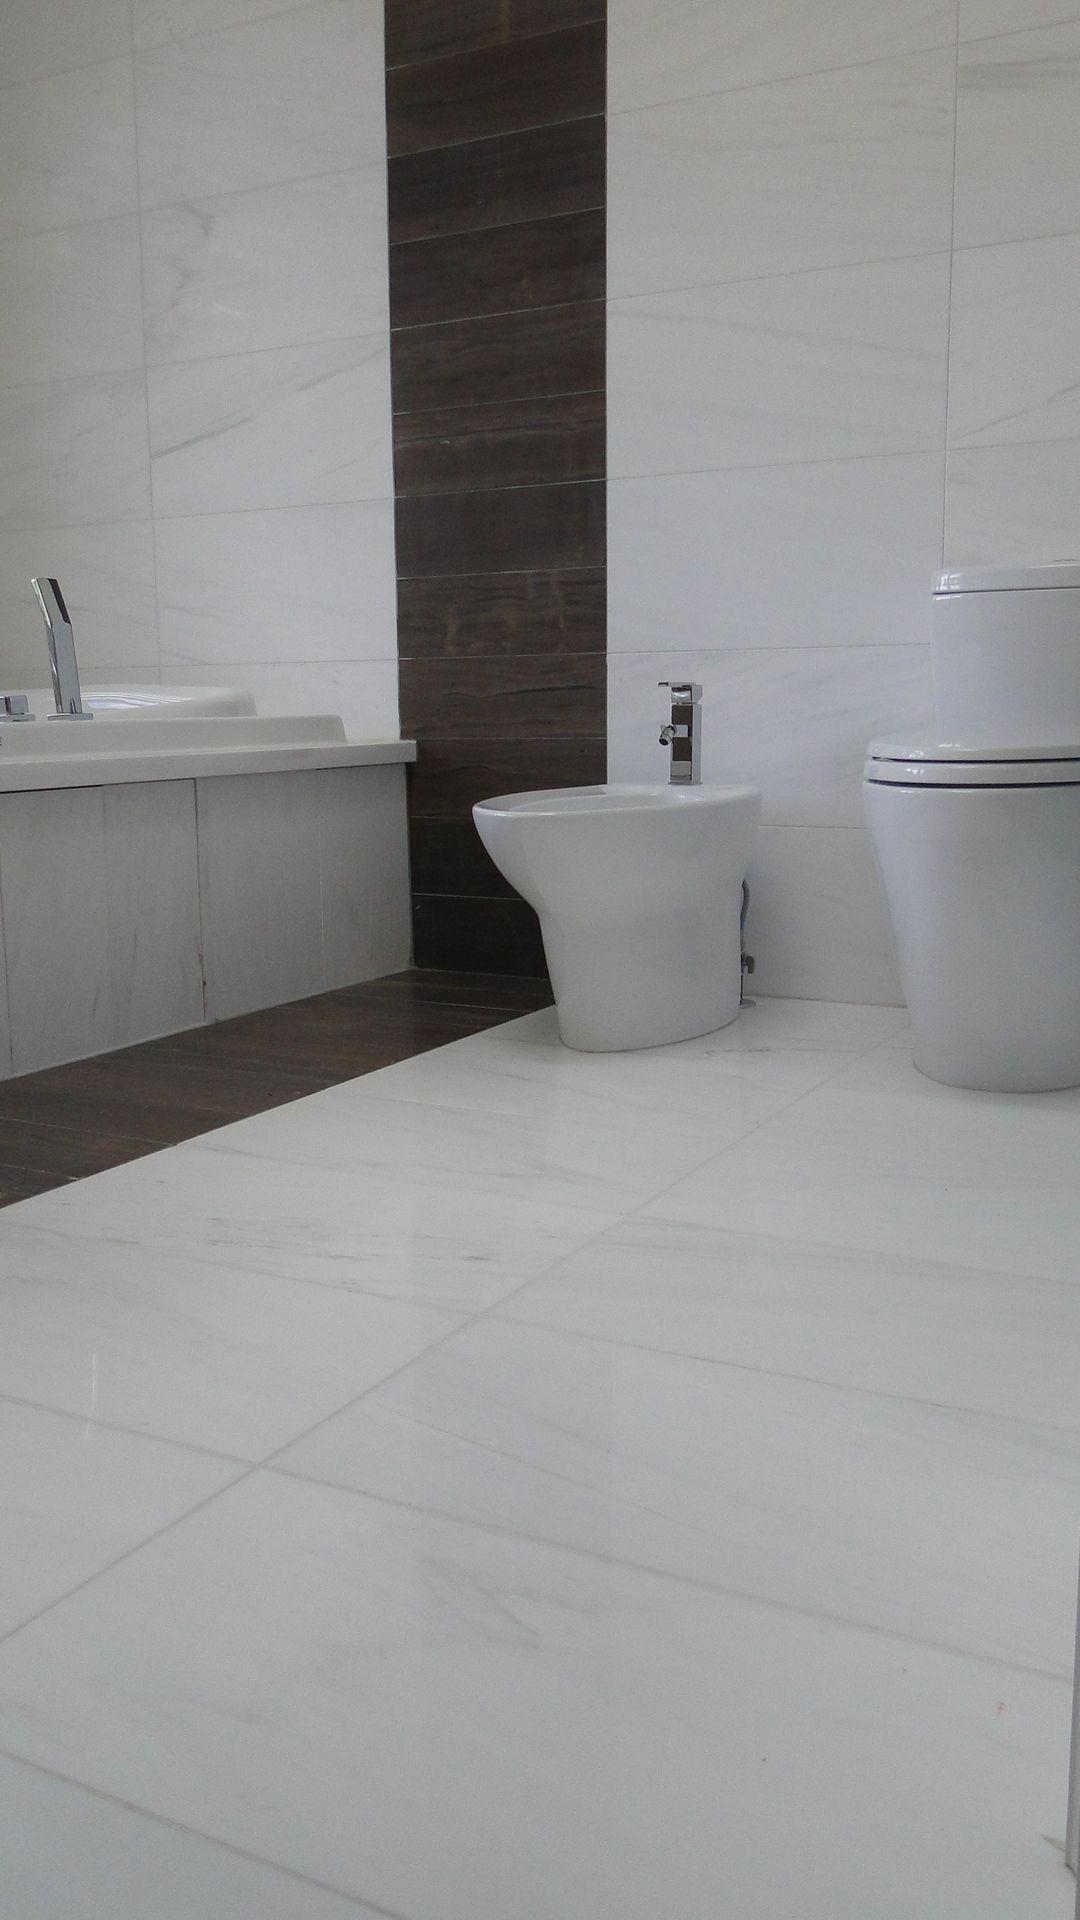 Bathroom Design Toronto Unique Truffle Veincut Honed Limestone And Govana Dolomite Marble Tile In Design Inspiration